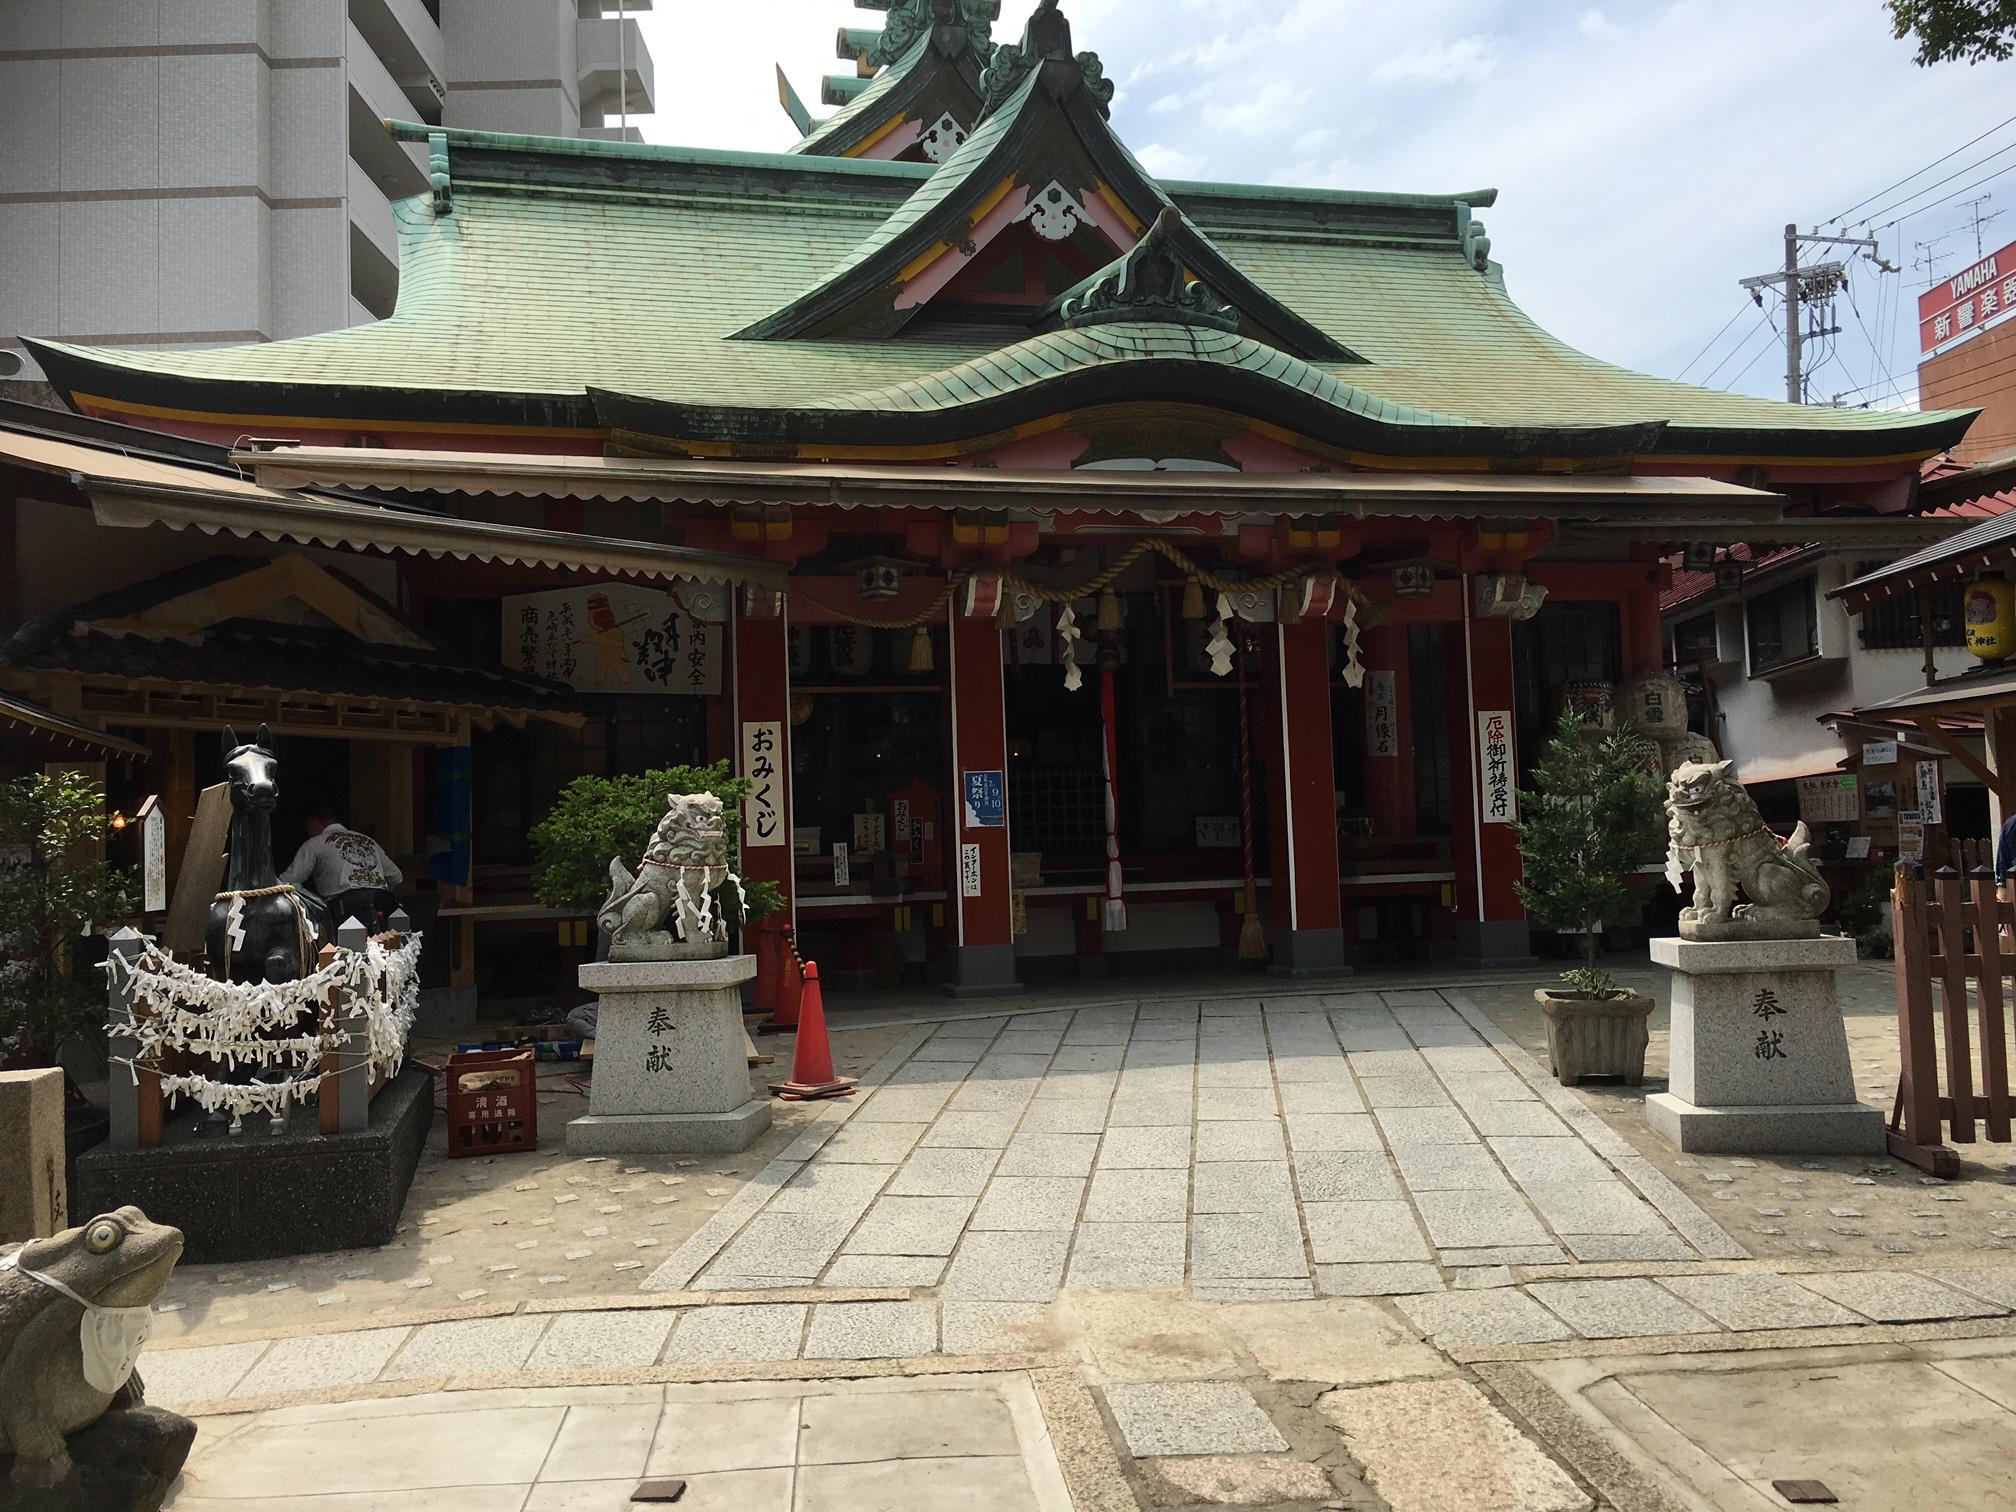 尼崎ゑびす神社 (尼崎市神田中通)